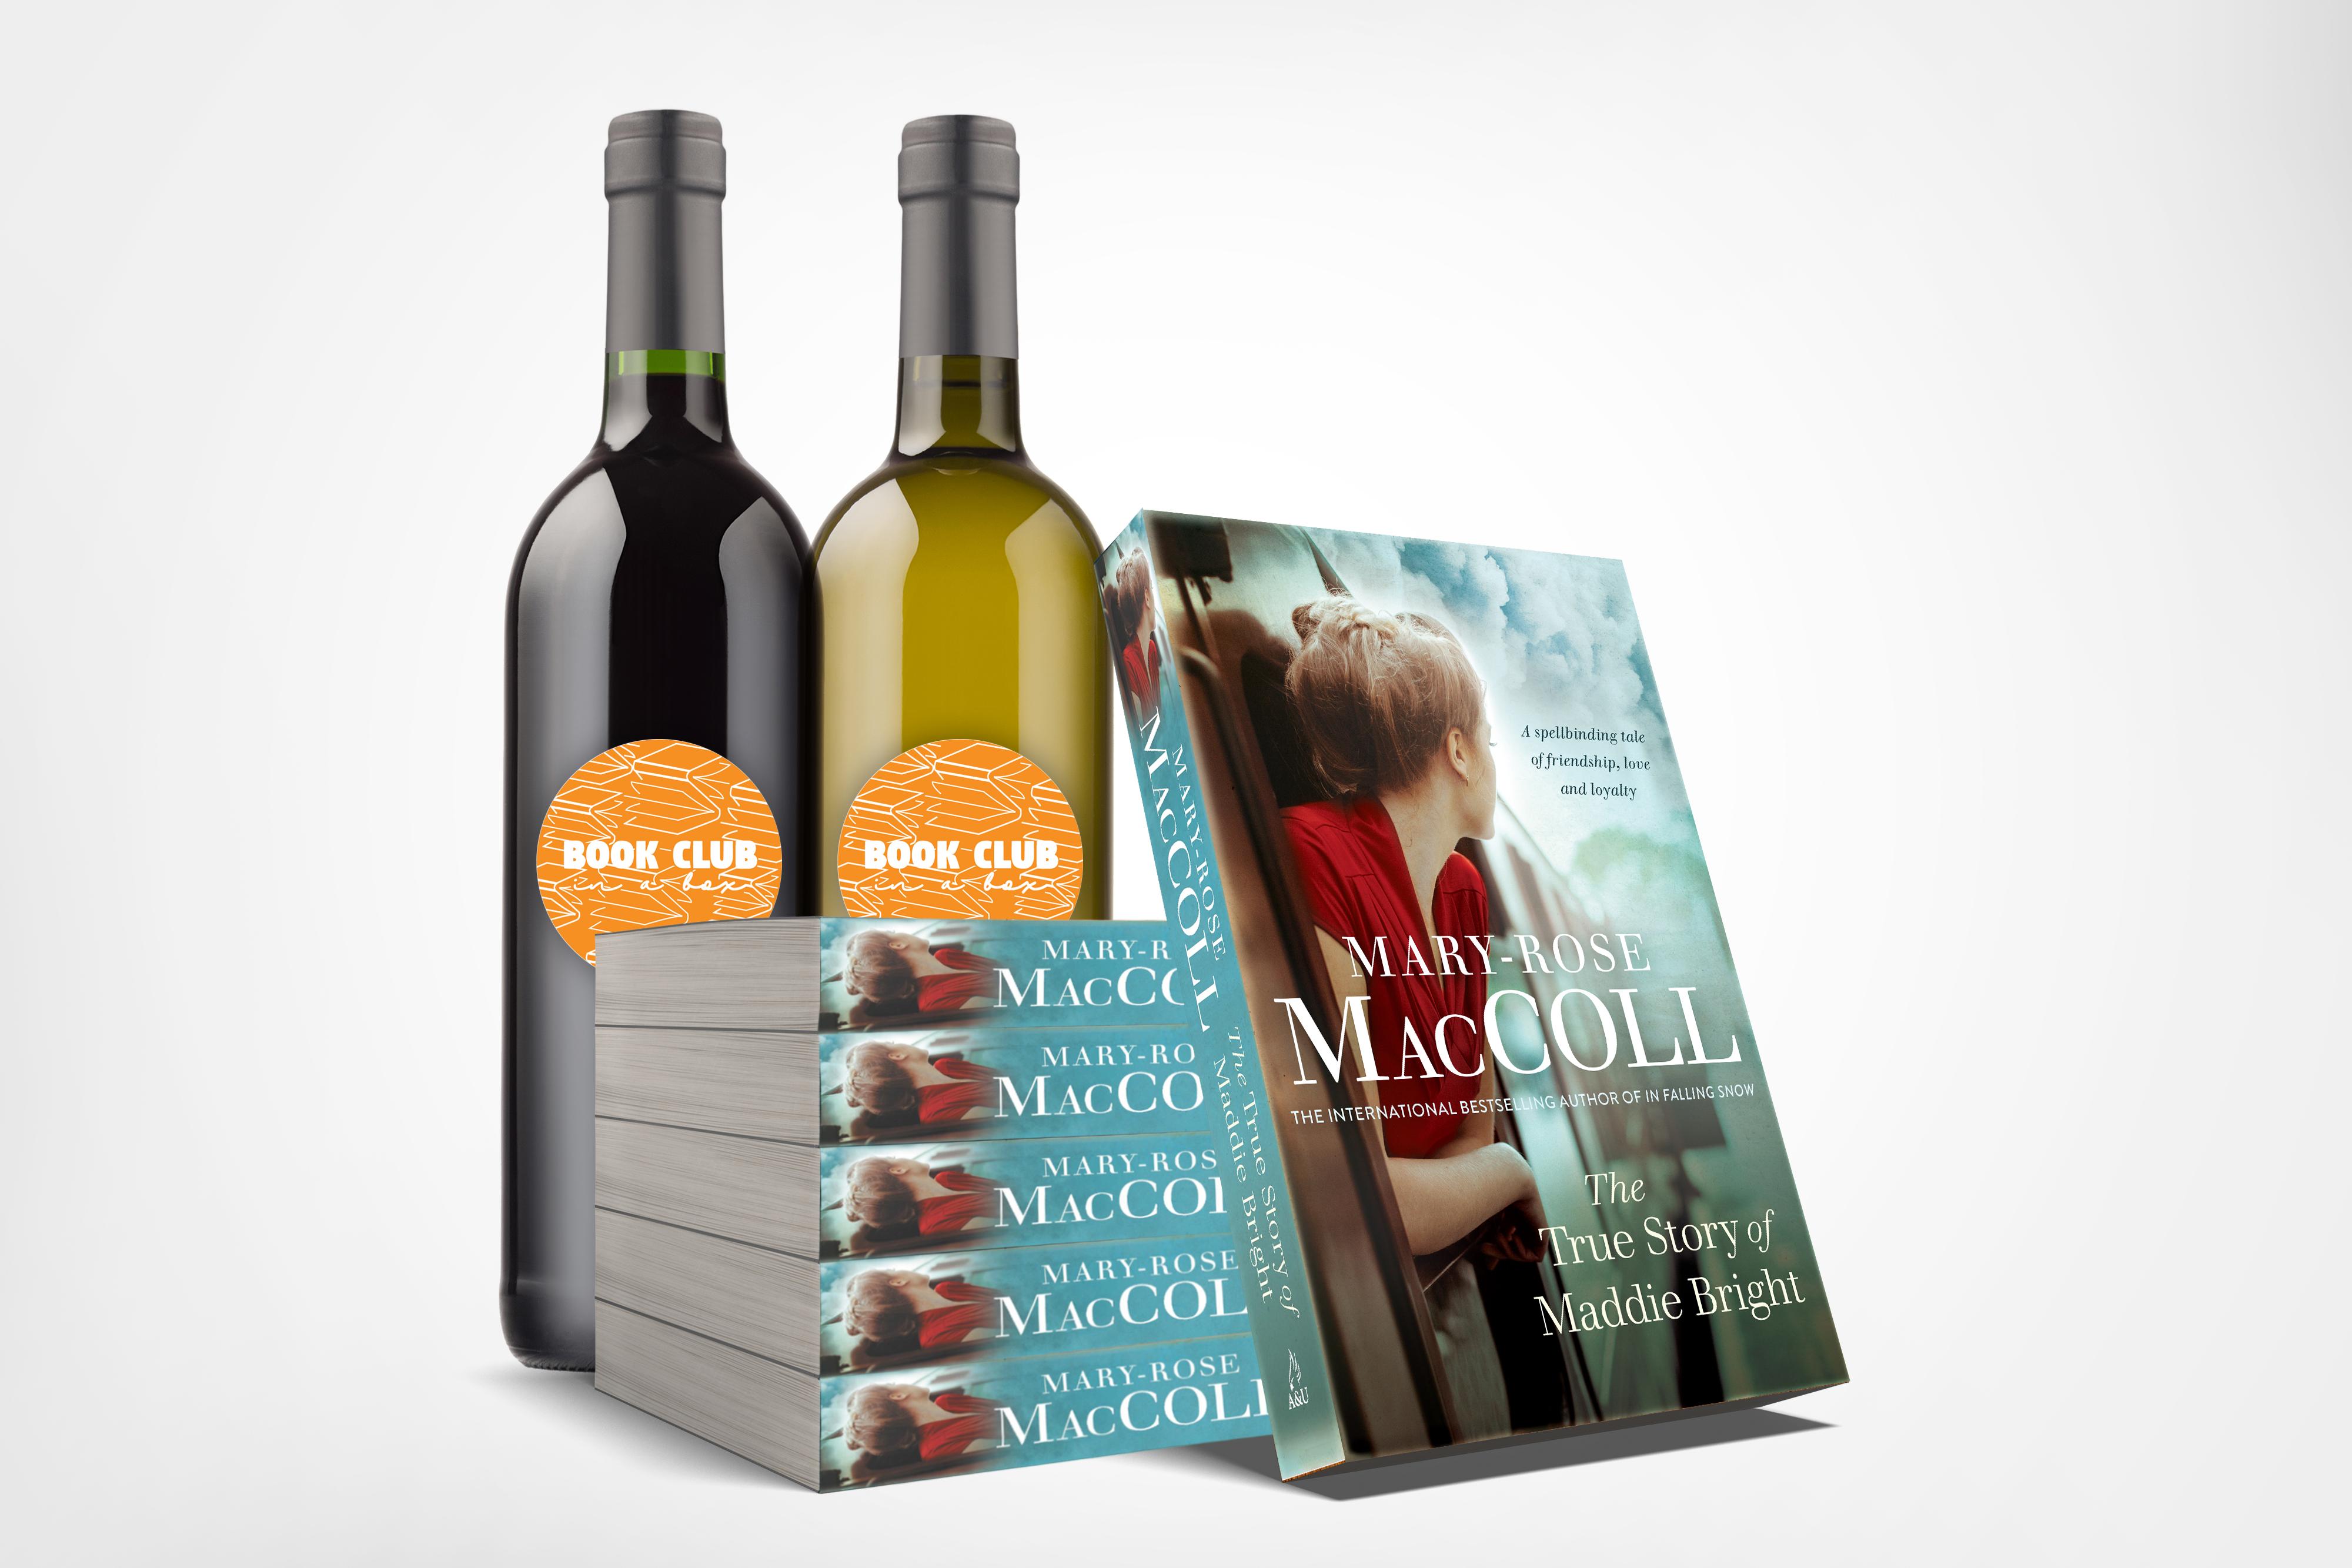 April Book Club in a Box prize